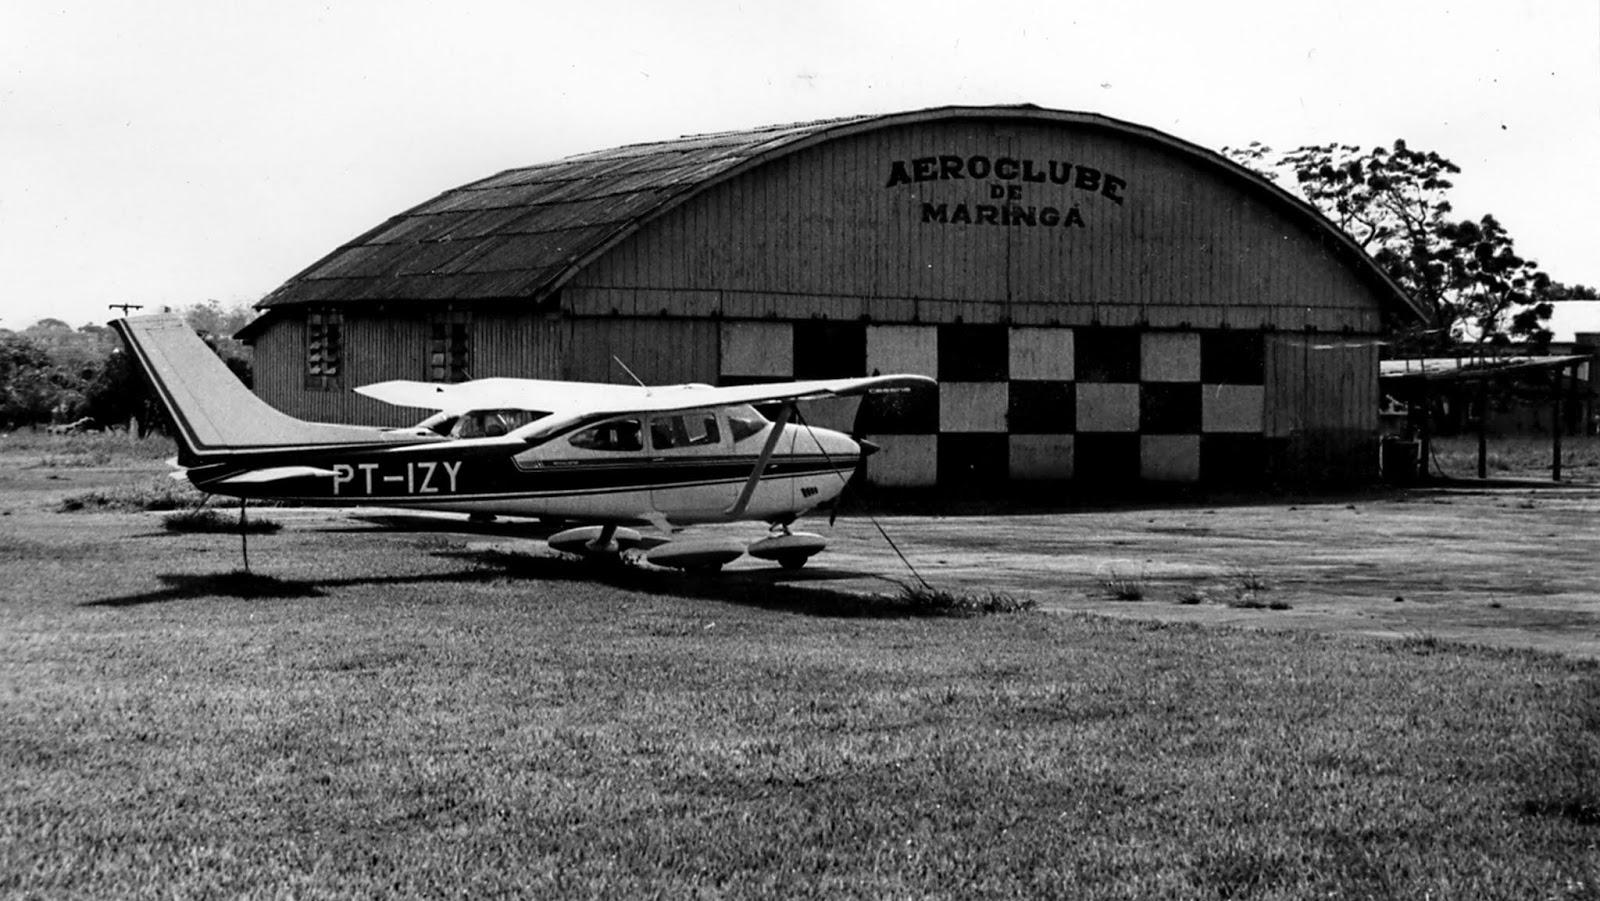 Aeroclube de Maringá - Década de 1980